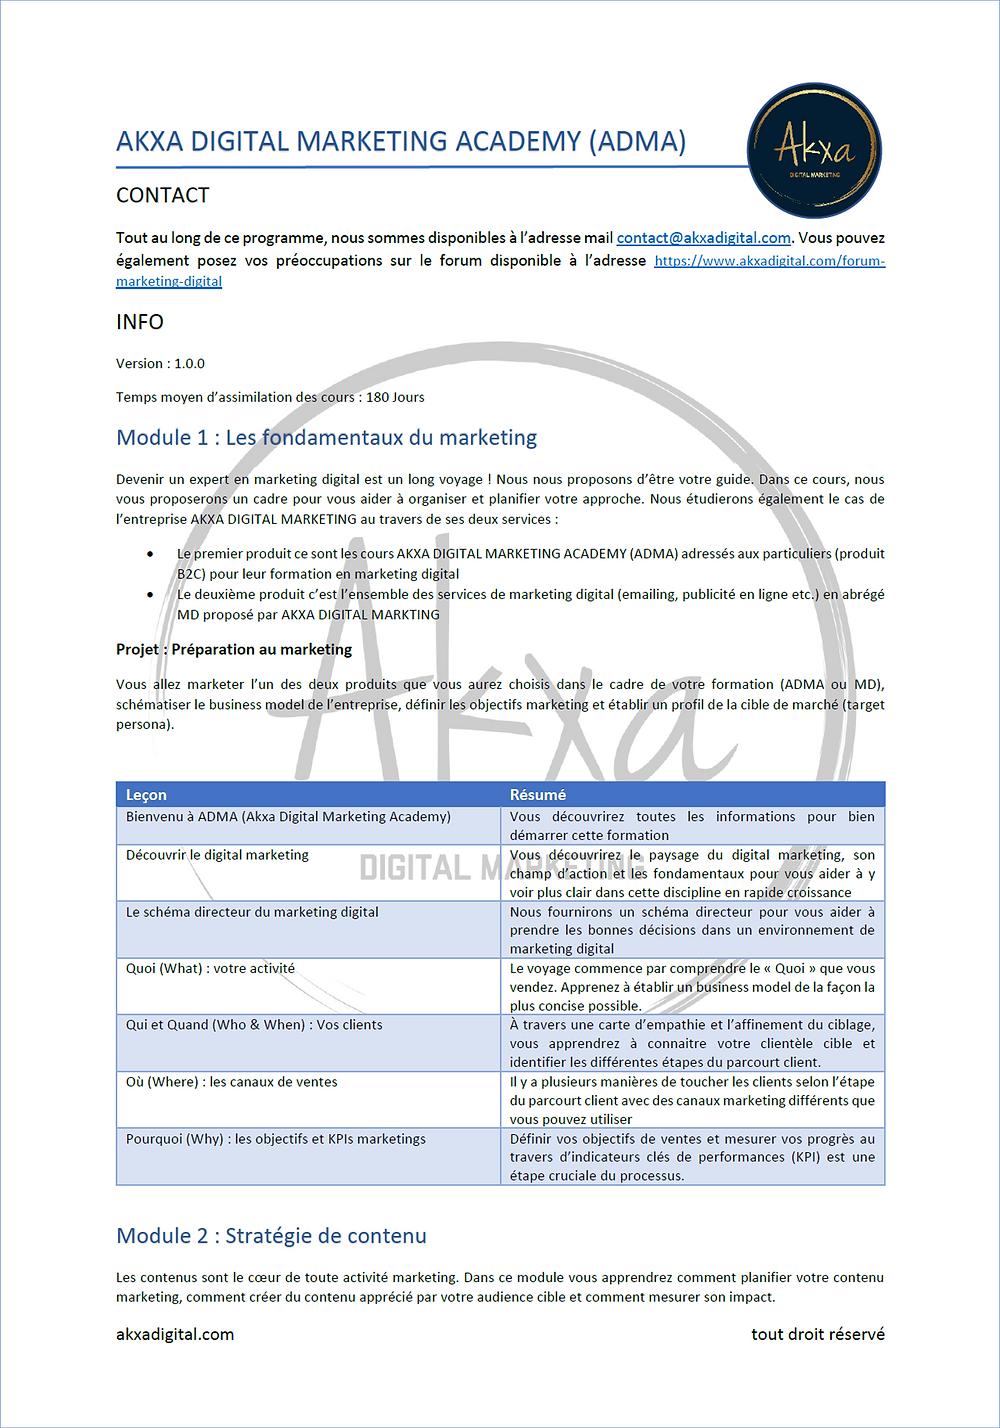 syllabus du programme ADMA (Akxa Digital Marketing Academy)